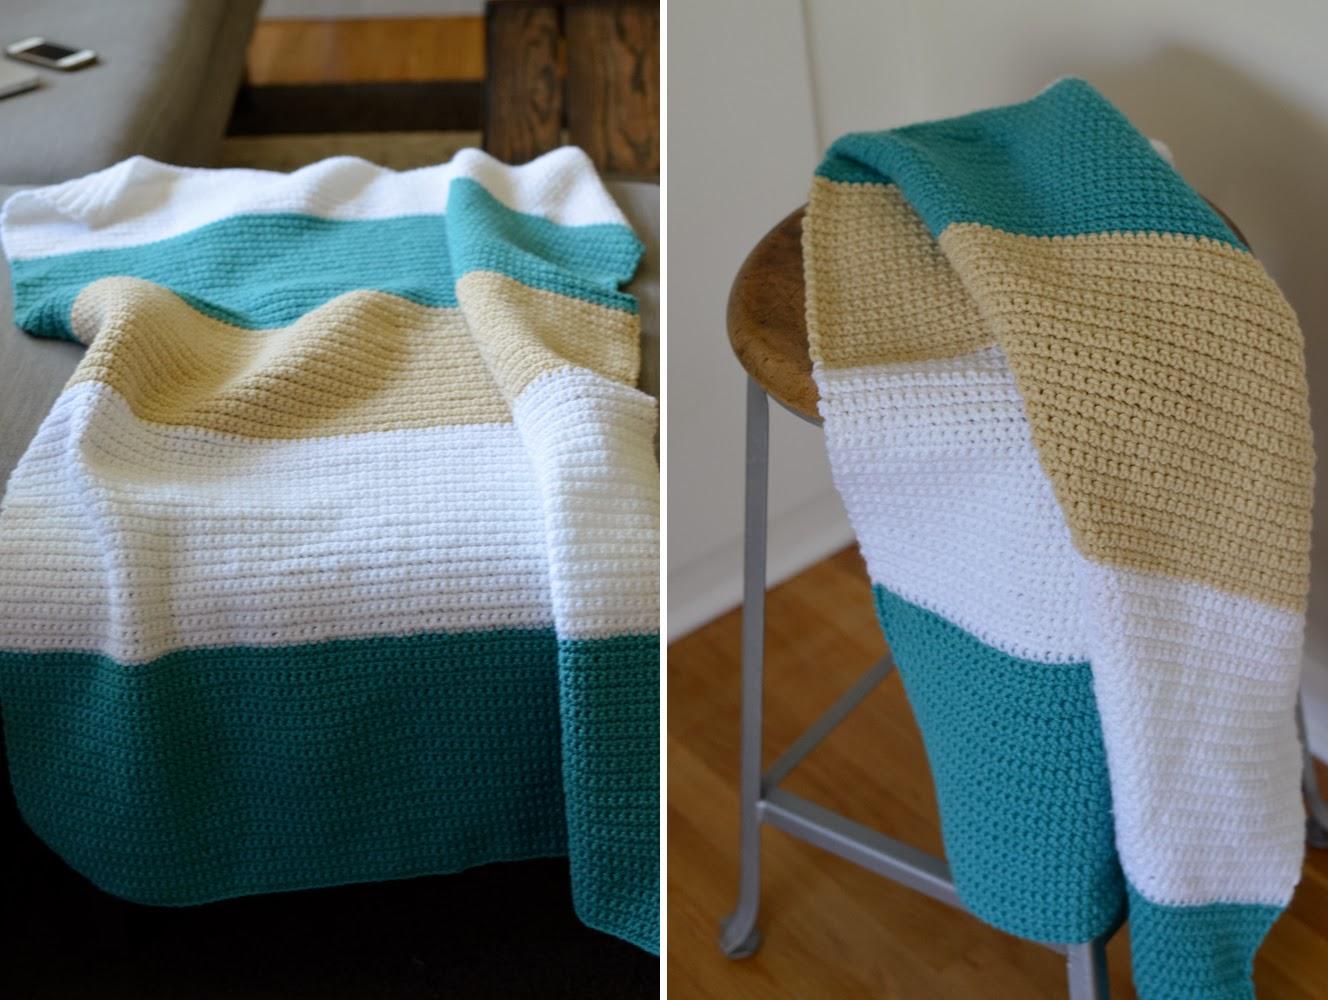 Sewing Barefoot: modern baby blanket